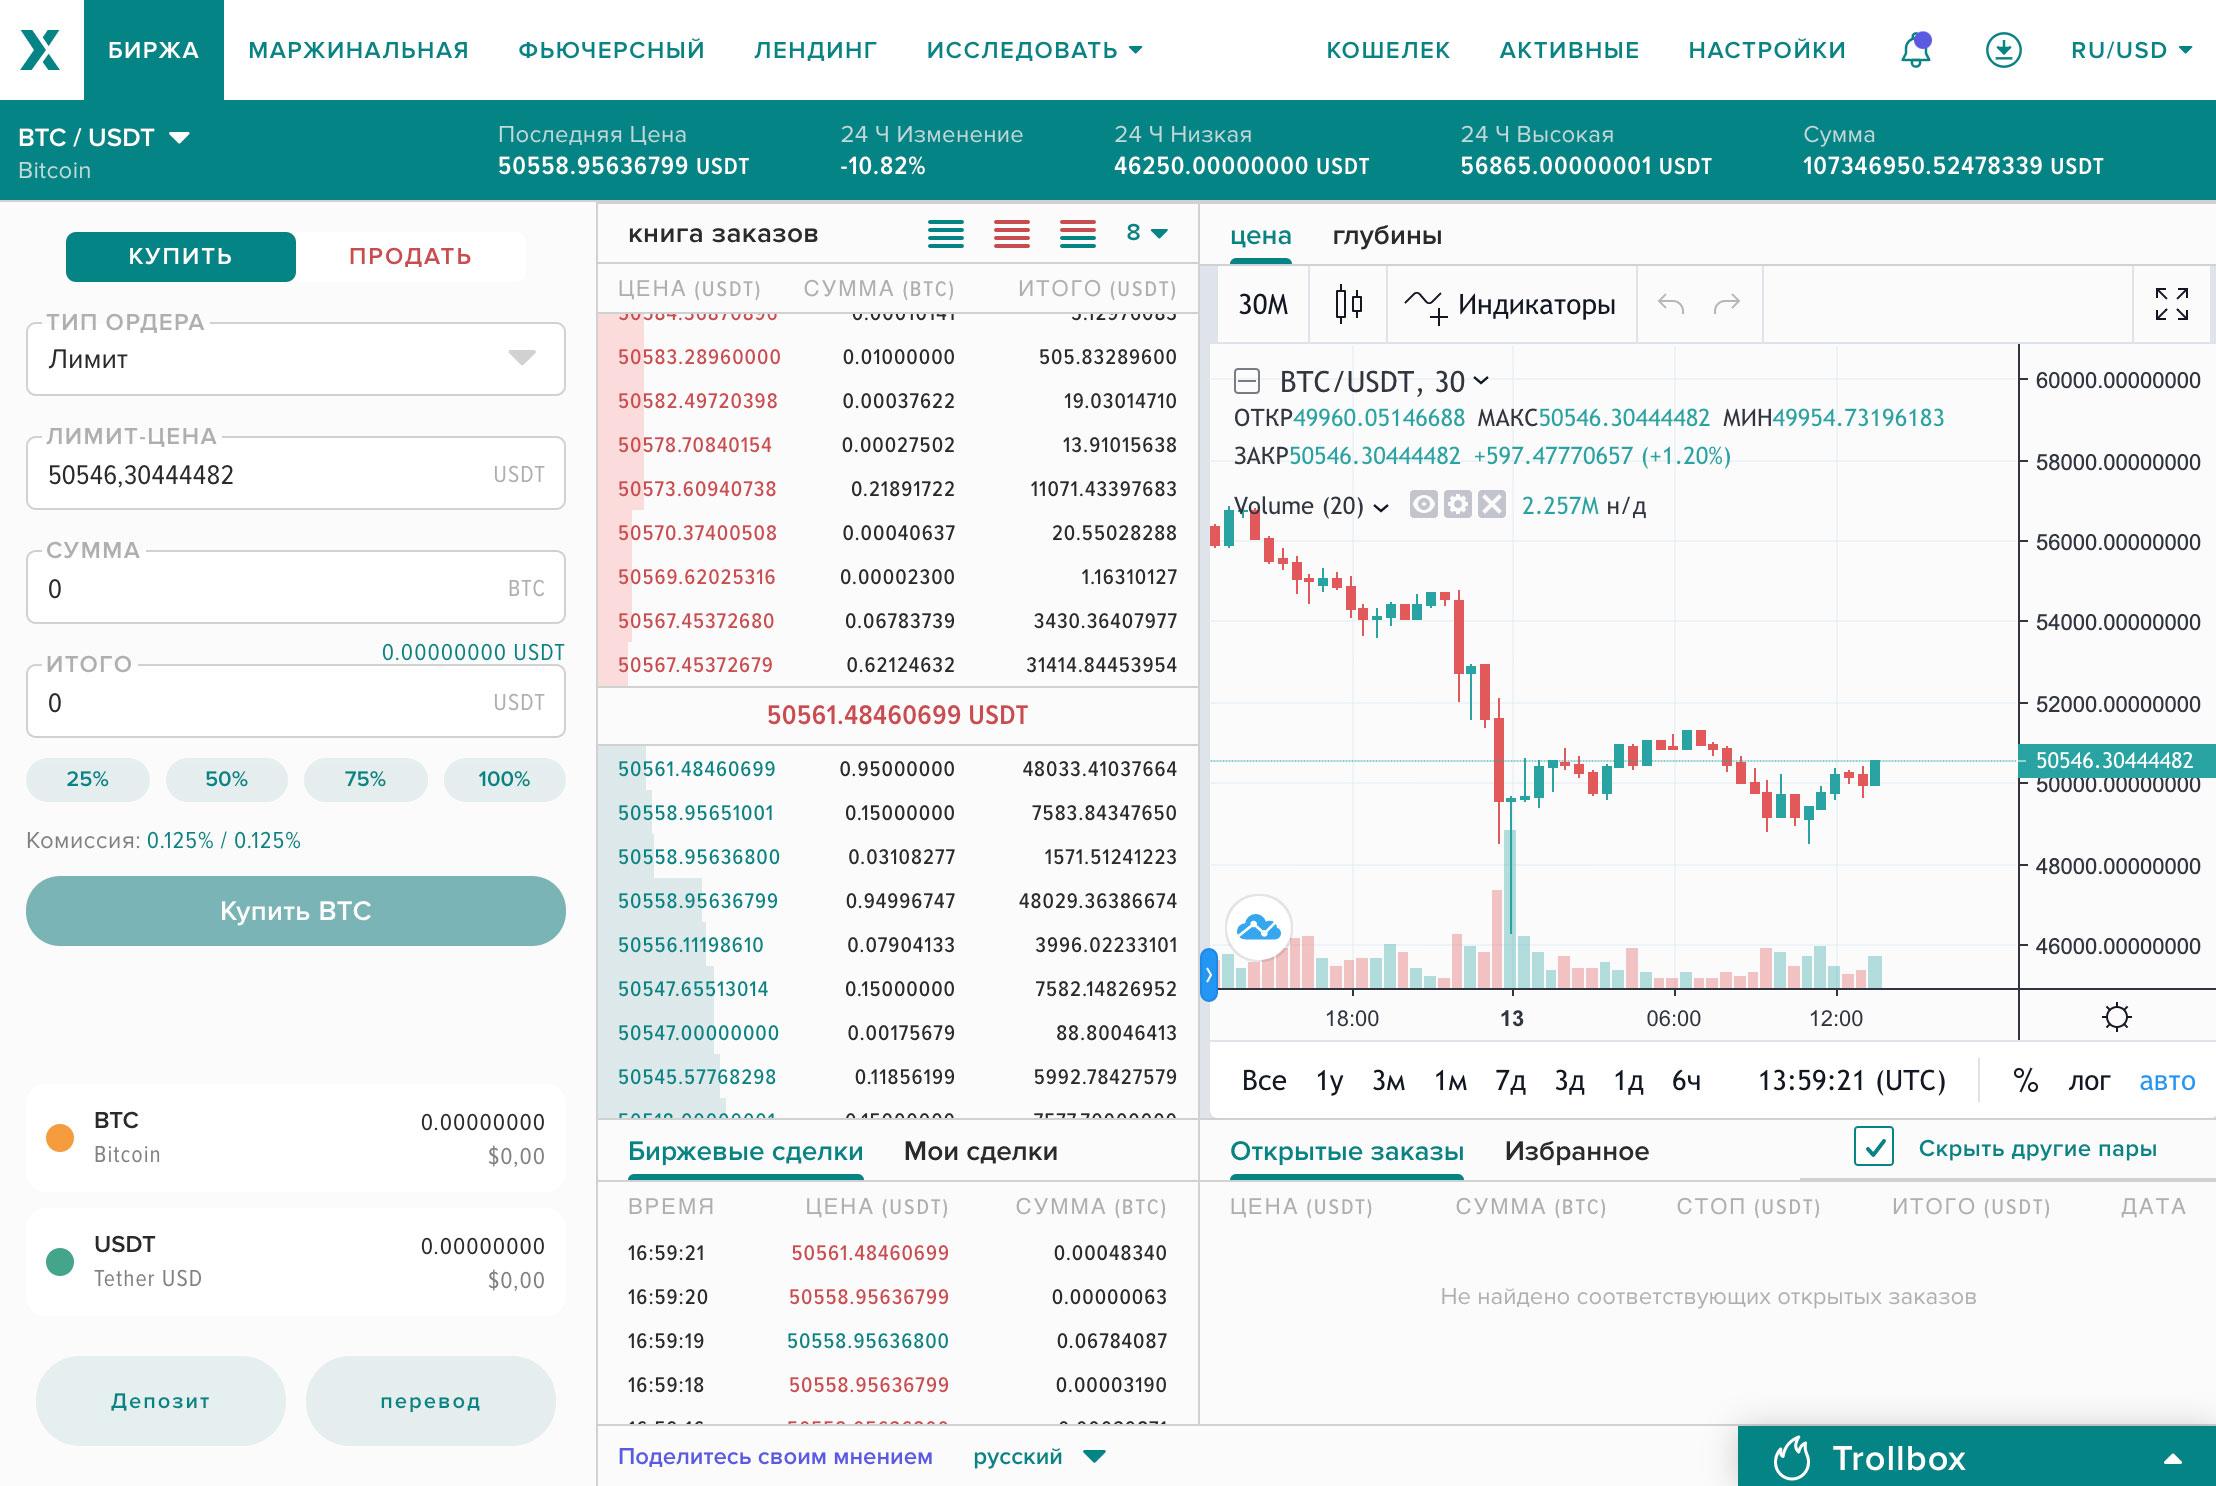 биржа криптовалют poloniex интерфейс платформы